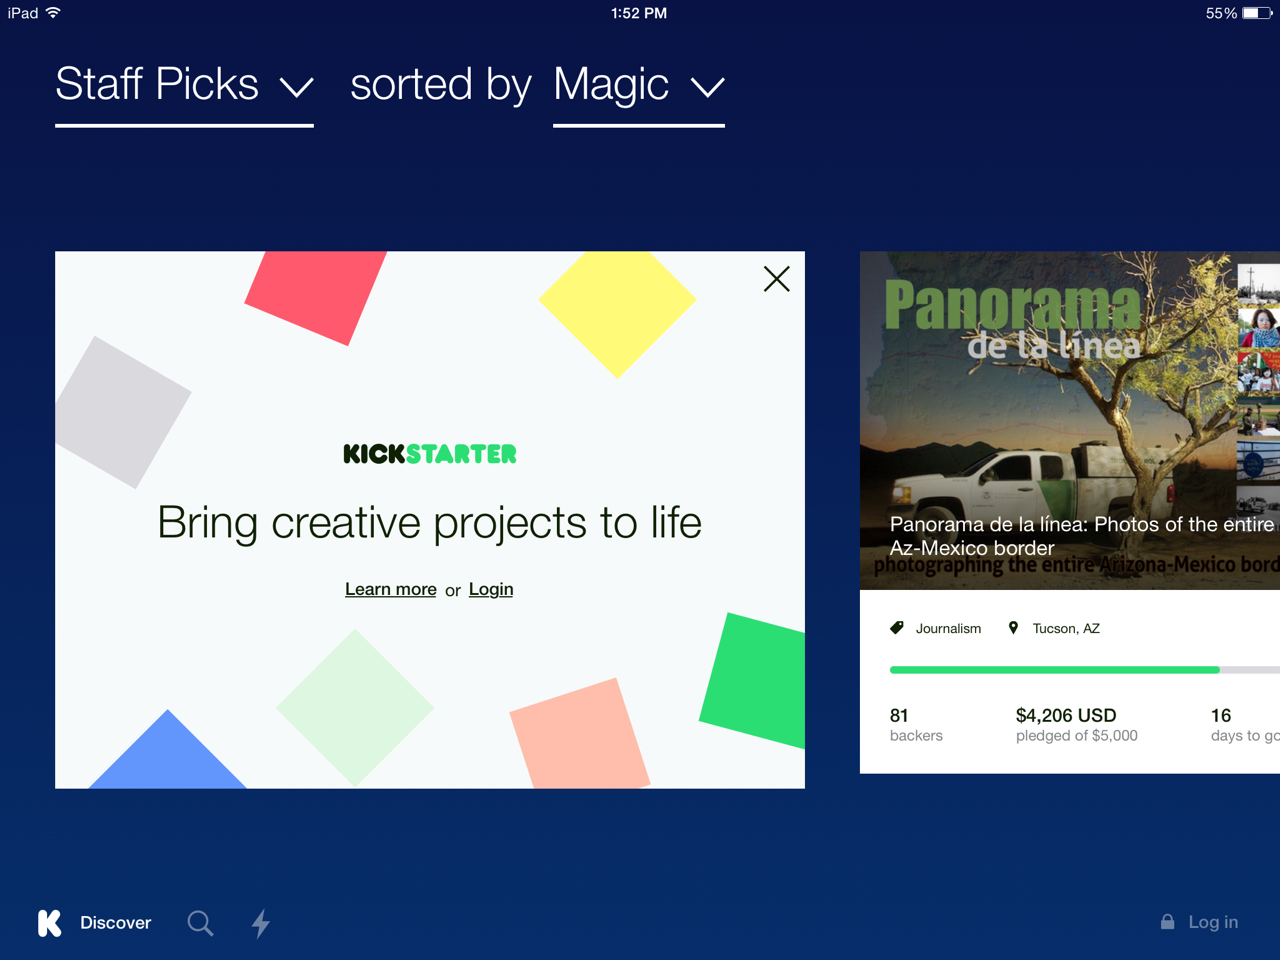 Kickstarter for iPad